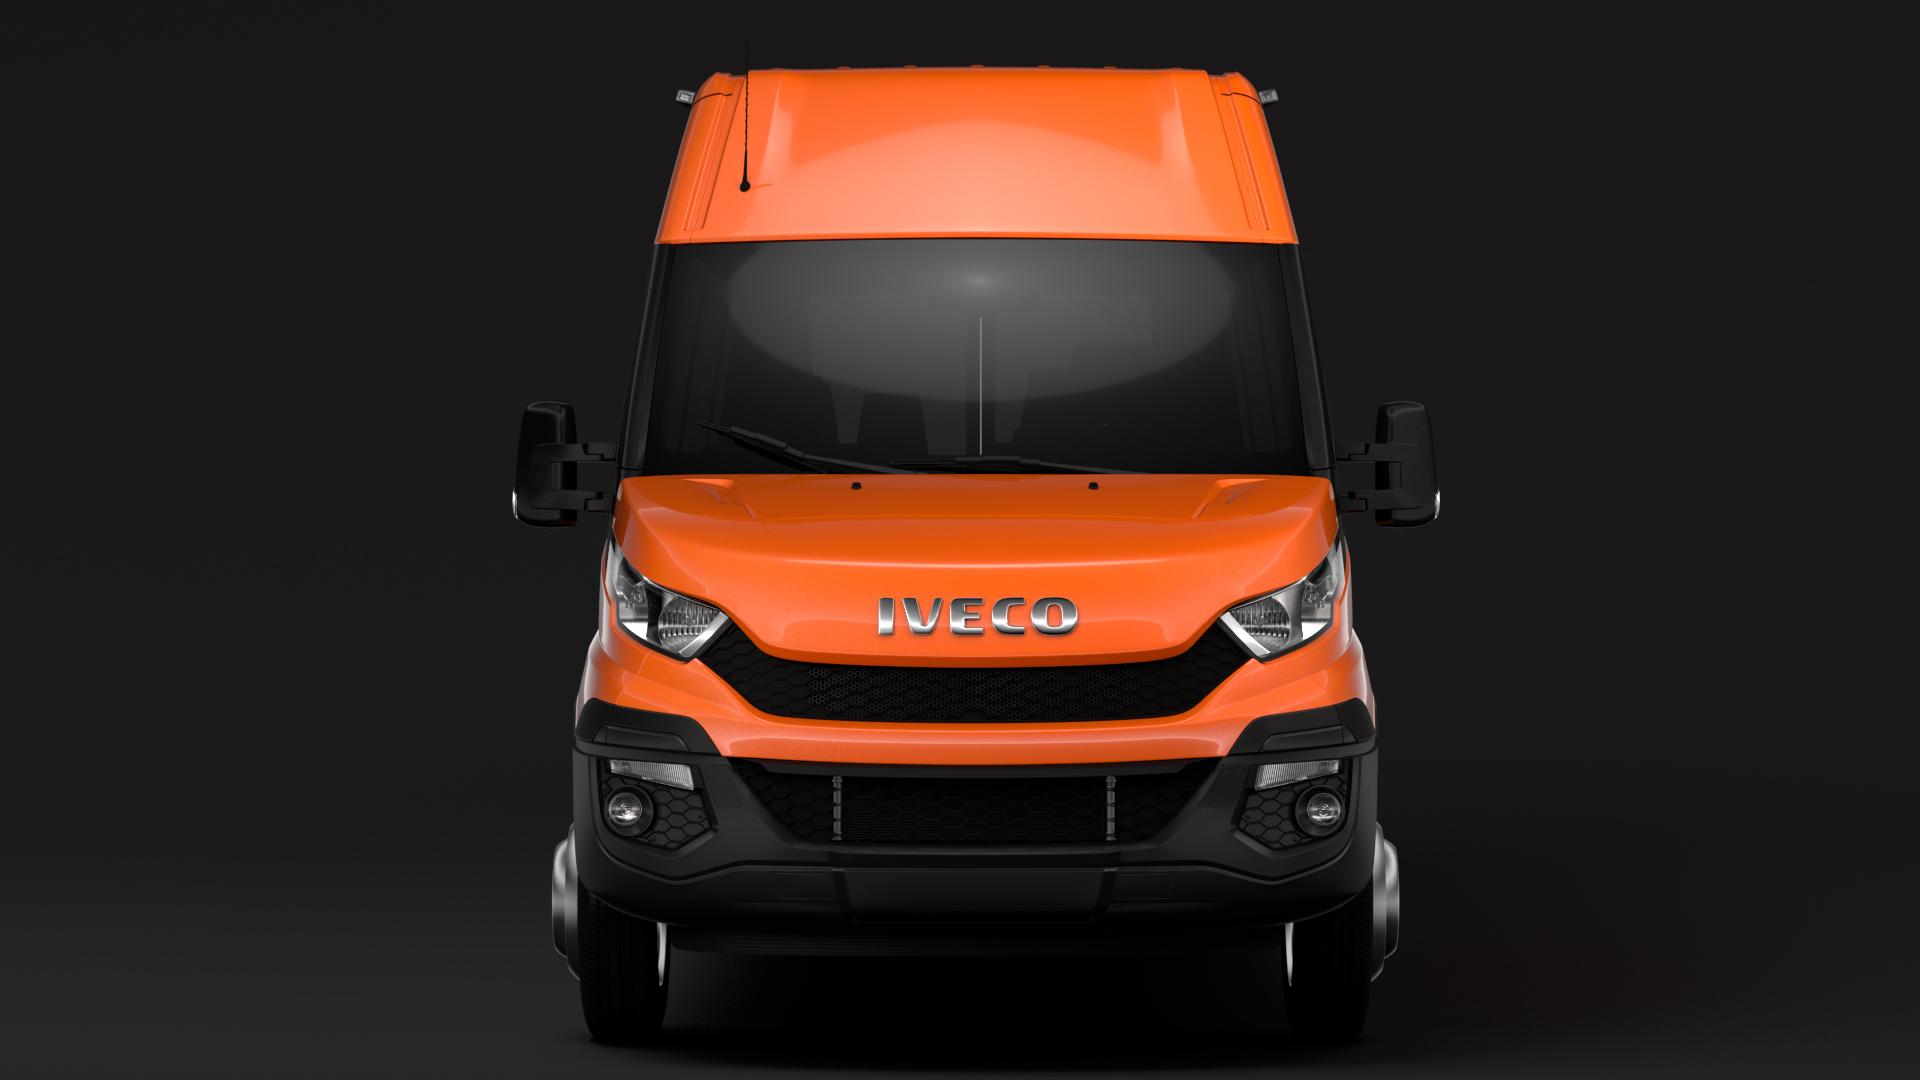 iveco daily minibus l3h2 2014-2016 3d model max fbx c4d lwo ma mb hrc xsi obj 276041